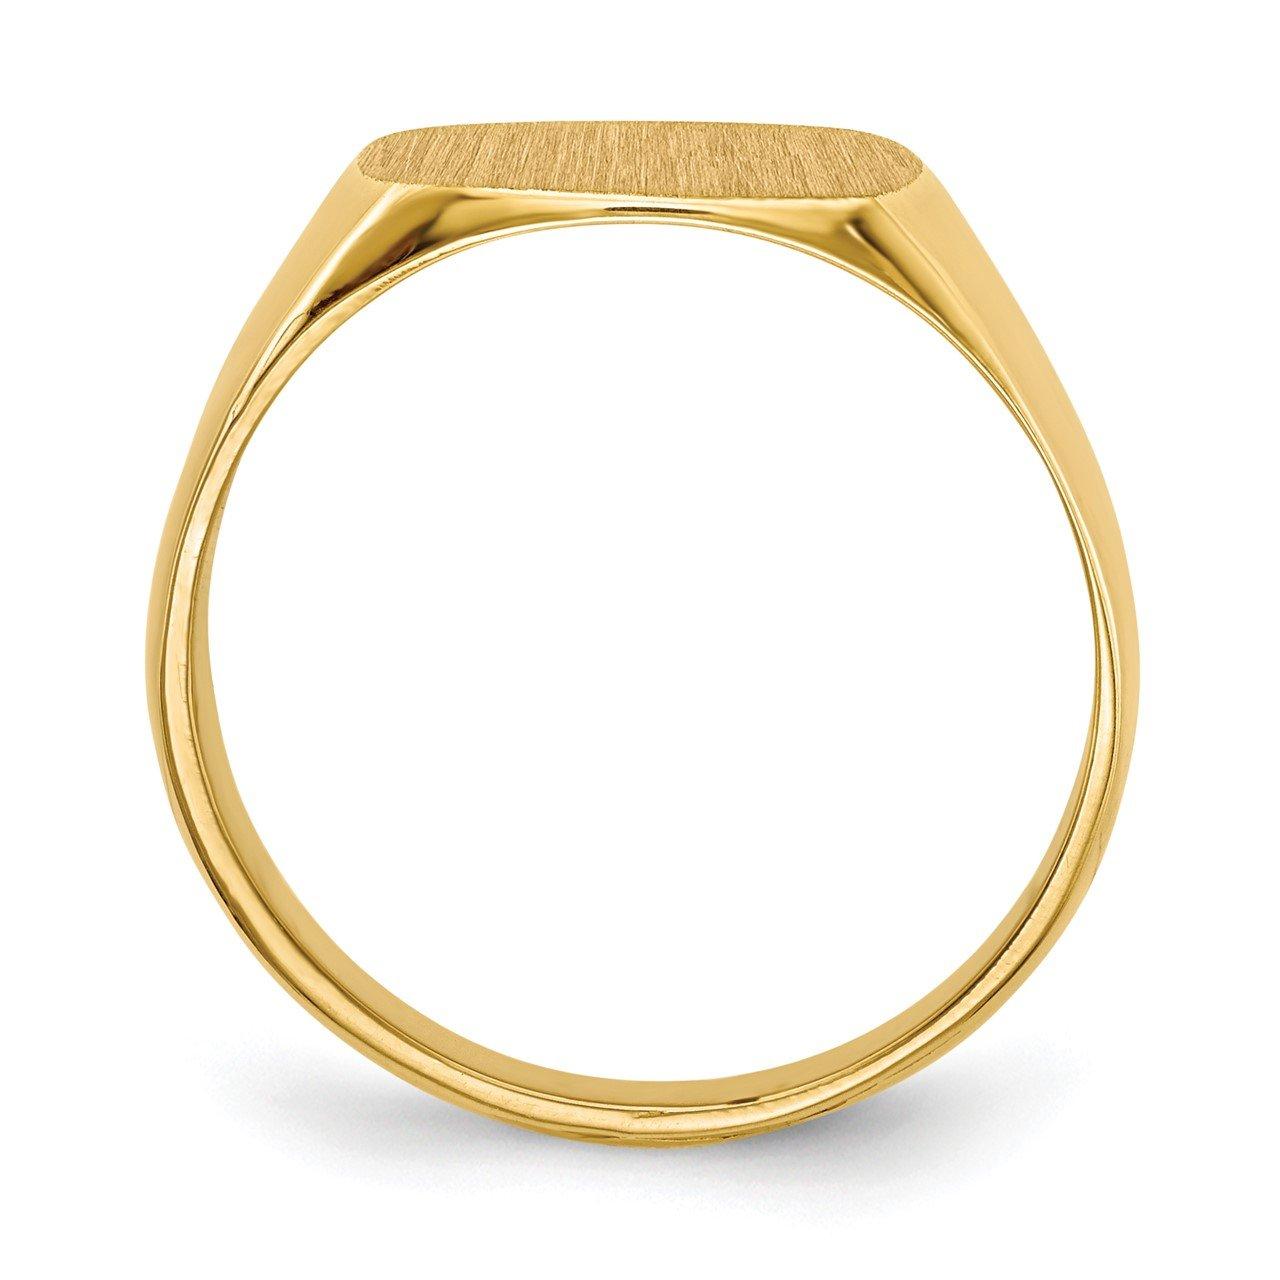 14k 12.0x13.0mm Closed Back Men's Signet Ring-1